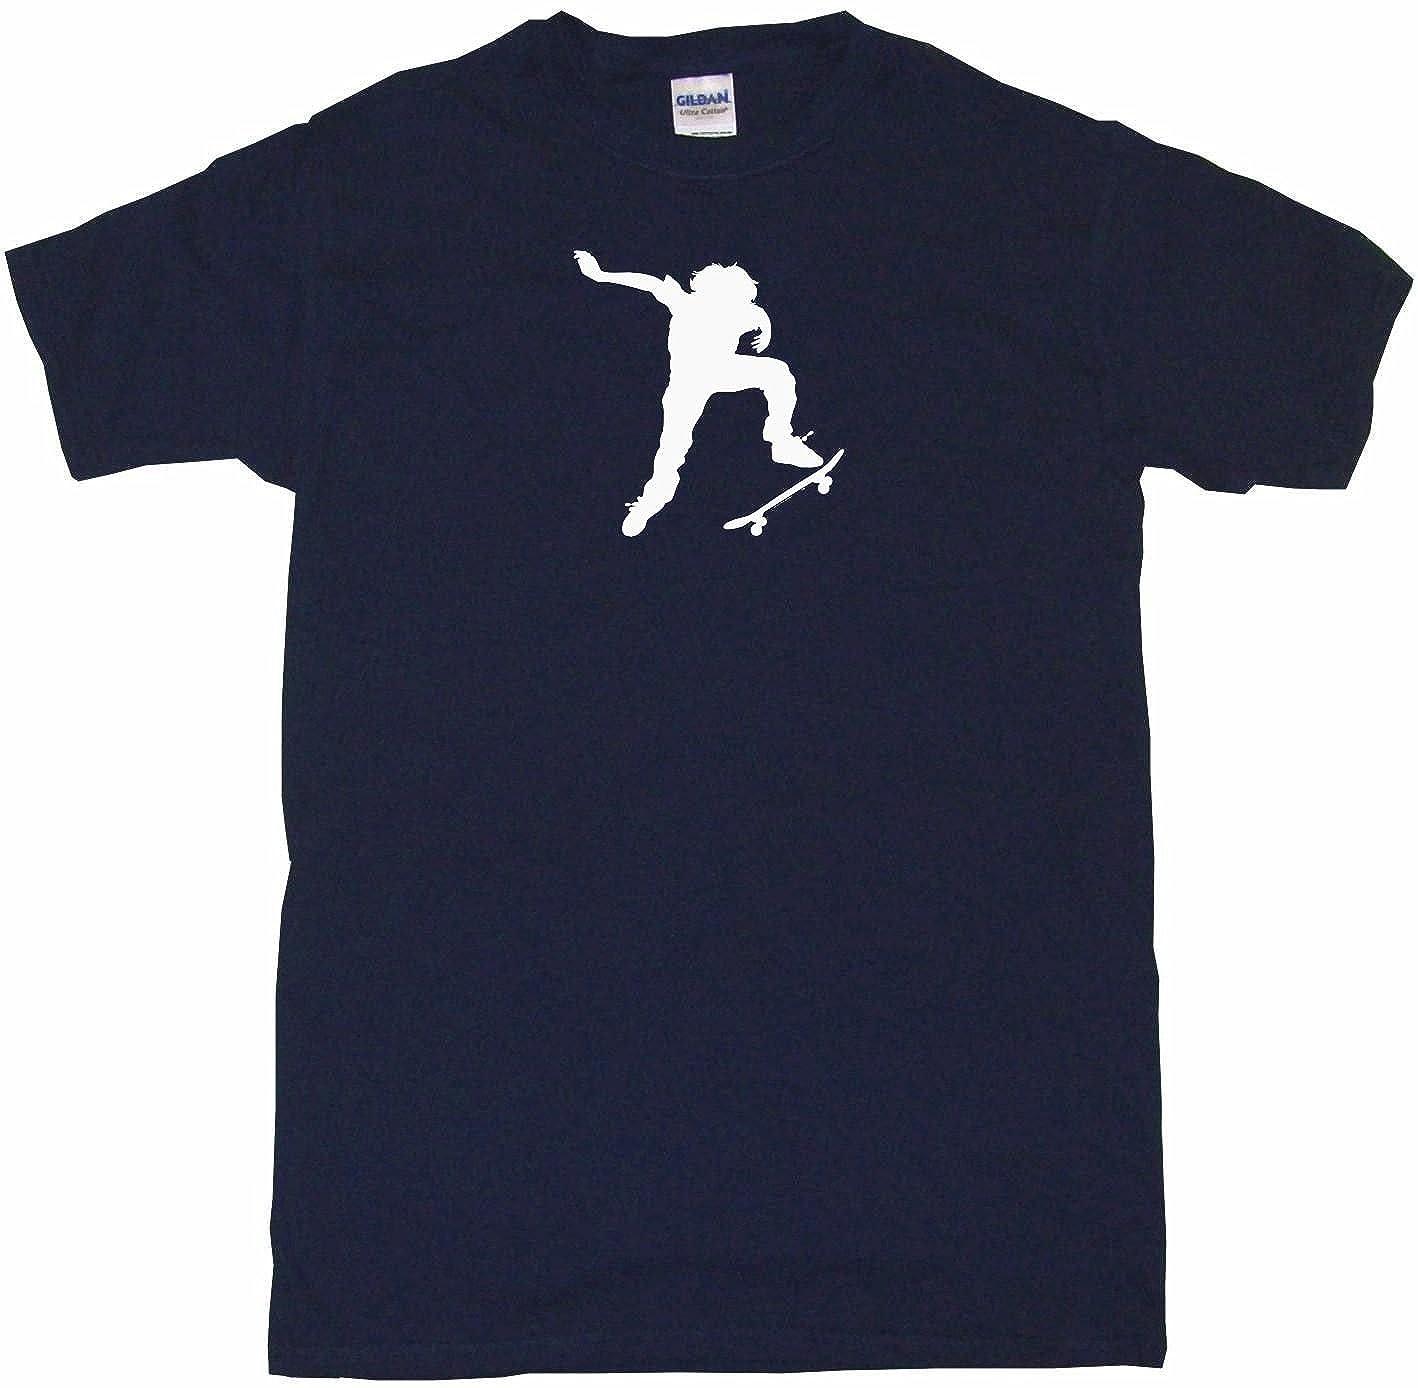 095bf4abc7 Ollie Skateboard Kid Silhouette Big Boy's Kids Tee Shirt